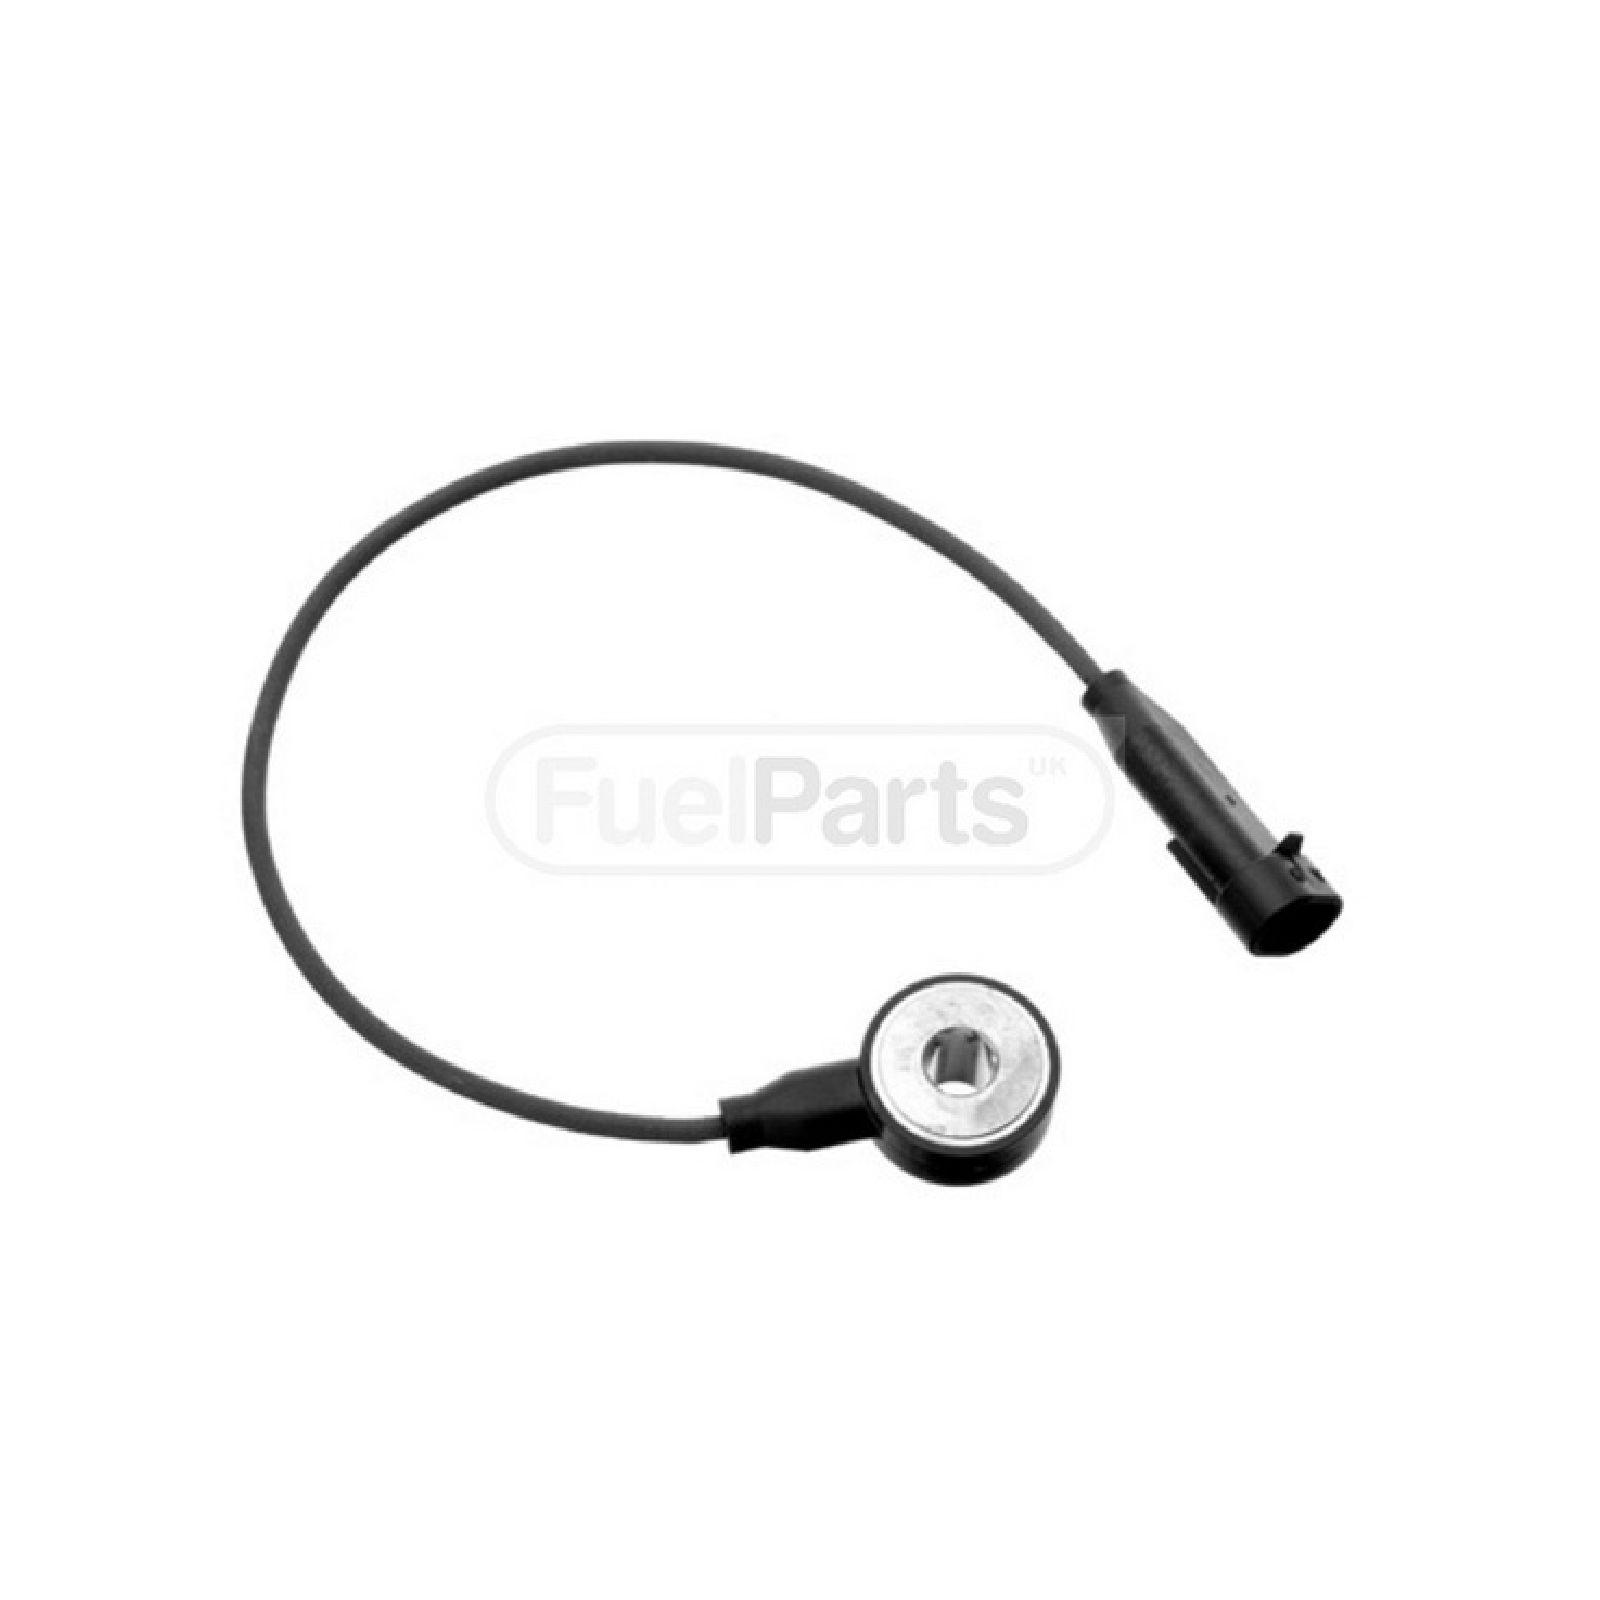 Fuel Parts Knock Sensor Genuine OE Quality Engine